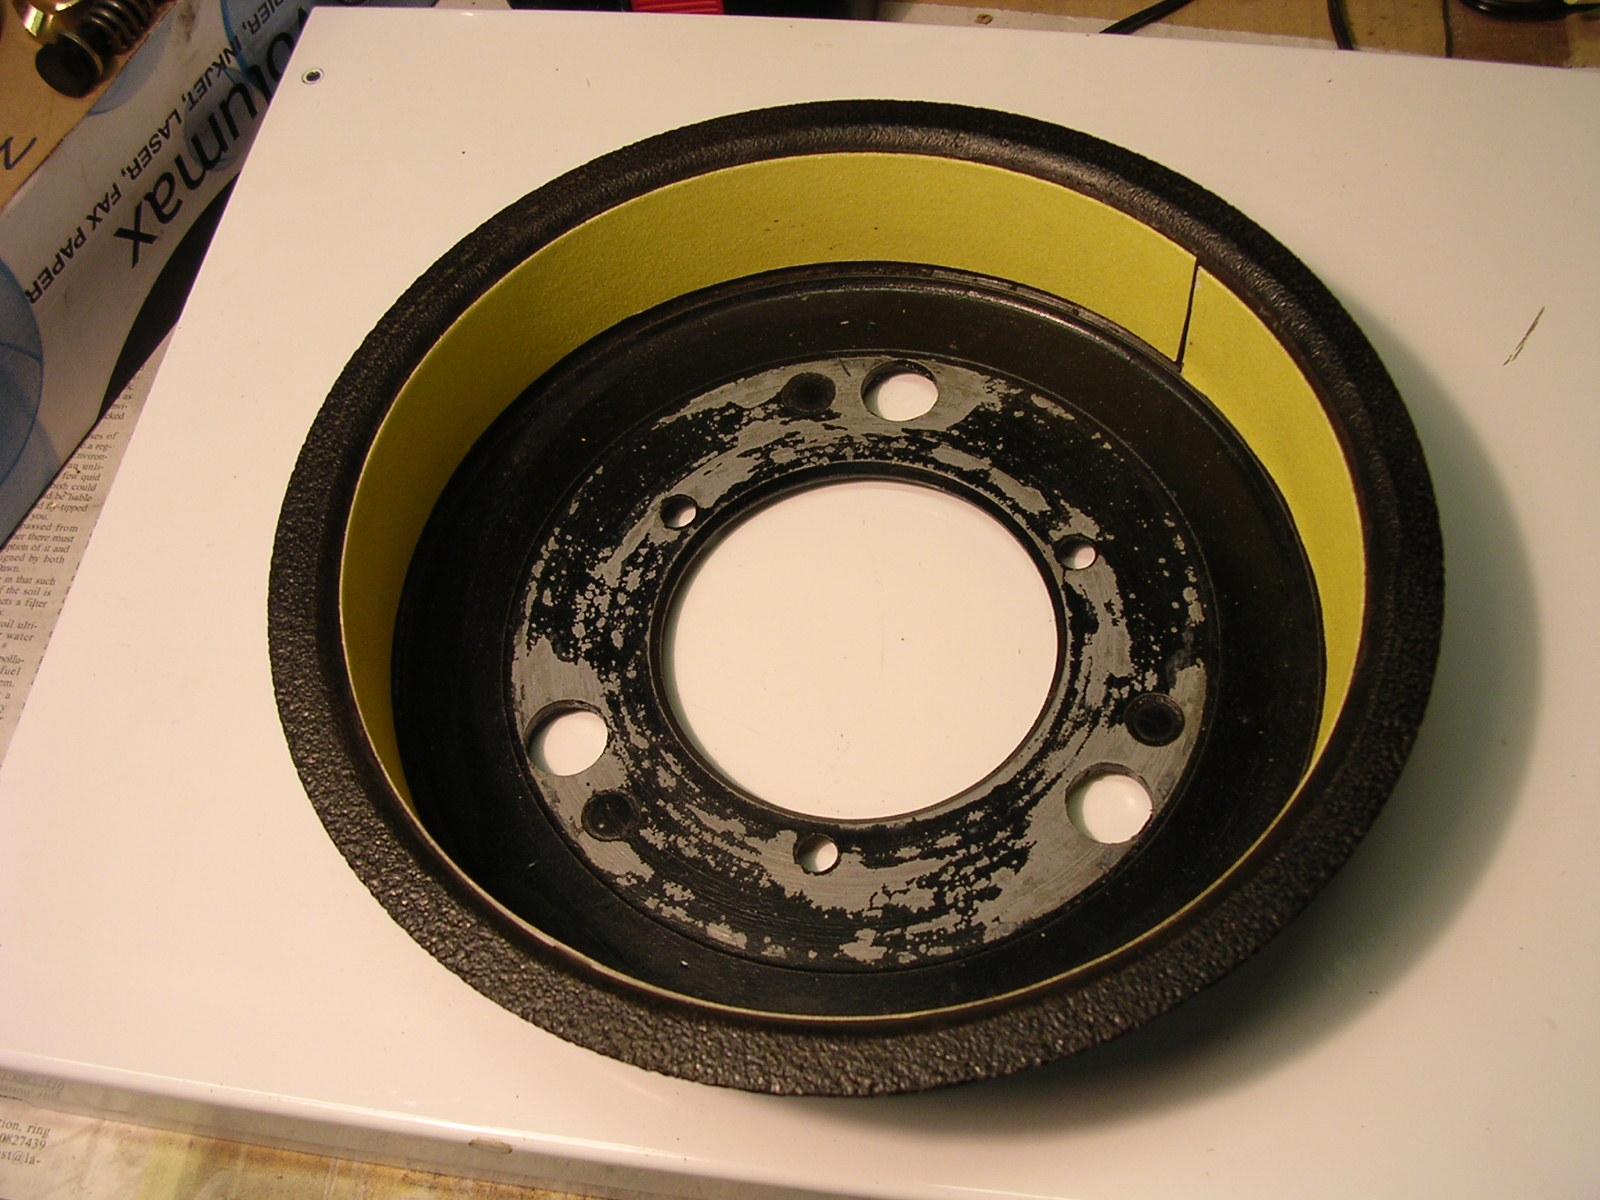 Relining Brake Drums : Bedding in new brake shoes